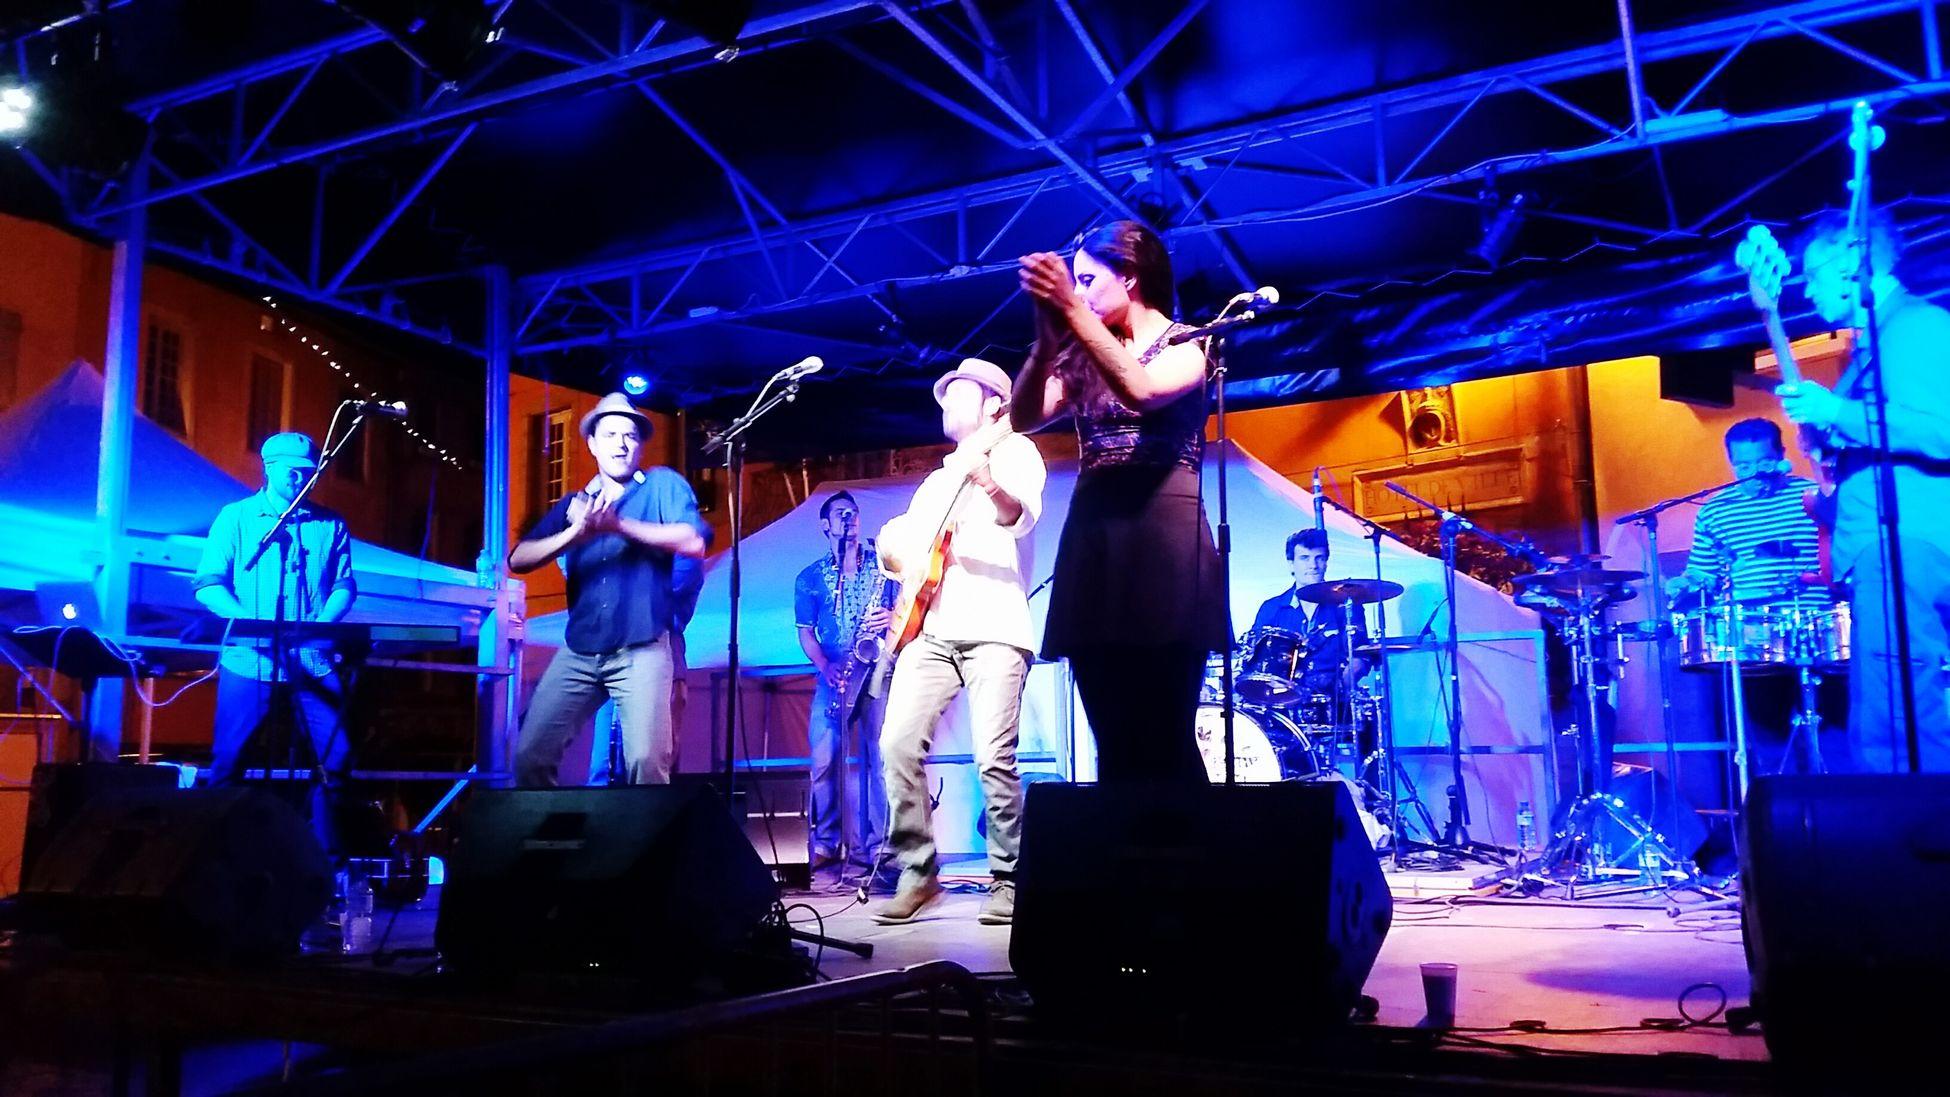 Musician Lasmala Band Mon Delire Hautes Alpes Concerts Artist My Life ❤ Enjoying Life Performance Bonheur Music